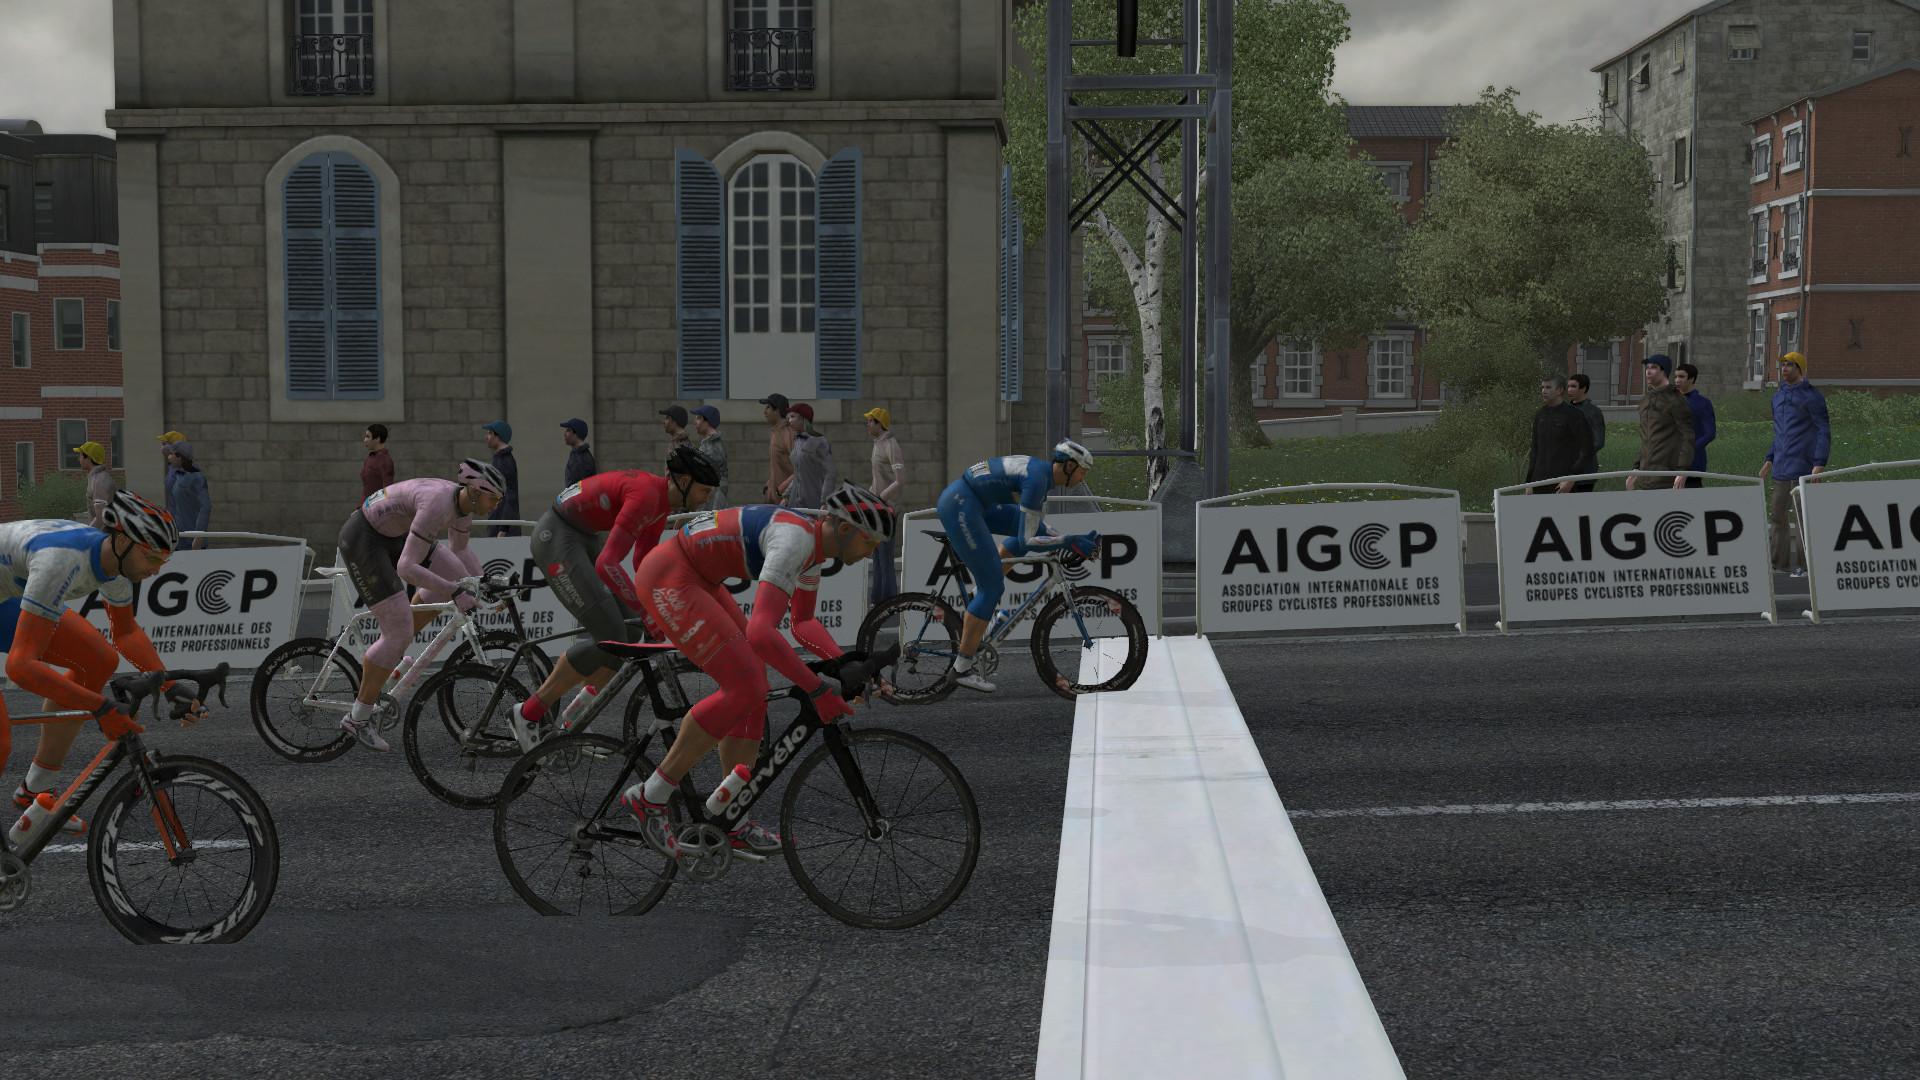 pcmdaily.com/images/mg/2019/Races/C1/Uppsala/E5/20.jpg